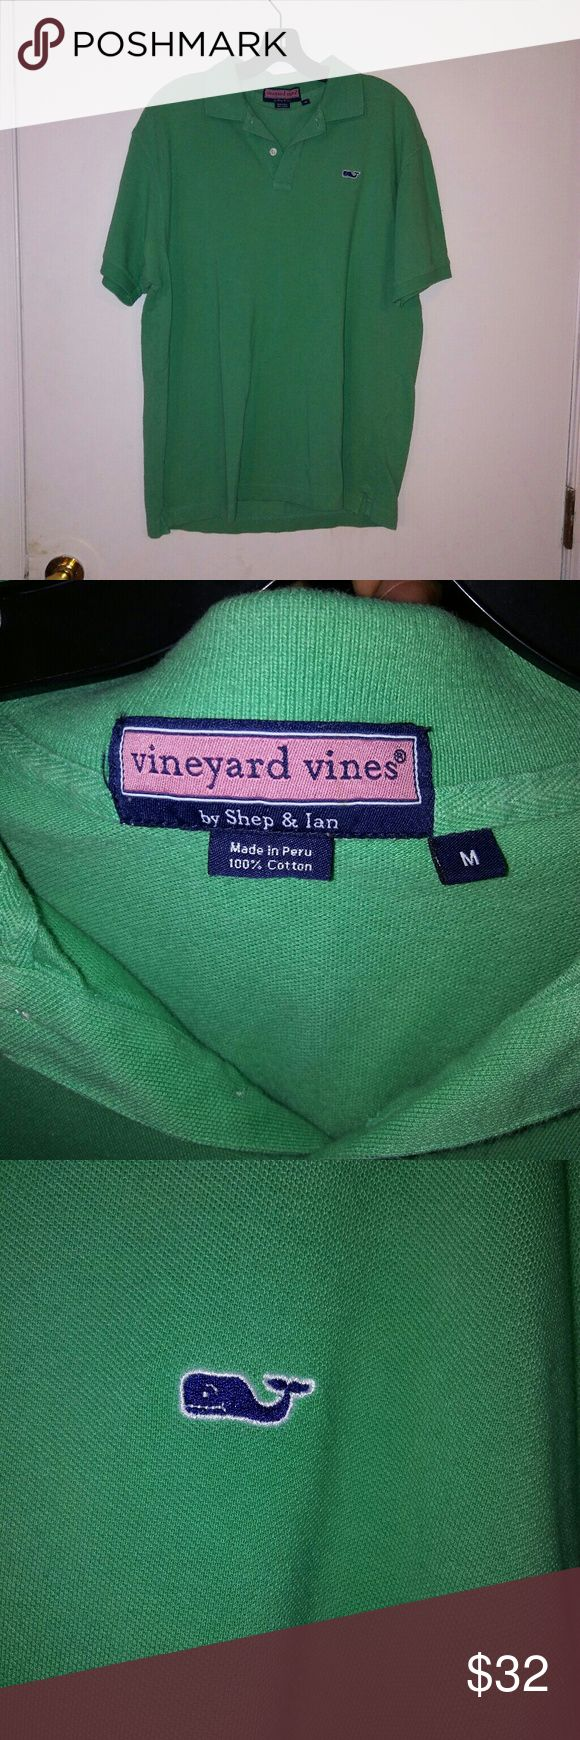 "Vineyard Vines Men Medium Light Green Polo Shirt No rips or stains, RN 2318245, 21"" acrosa & 27"" in length, 100% cotton Vineyard Vines Shirts Polos"